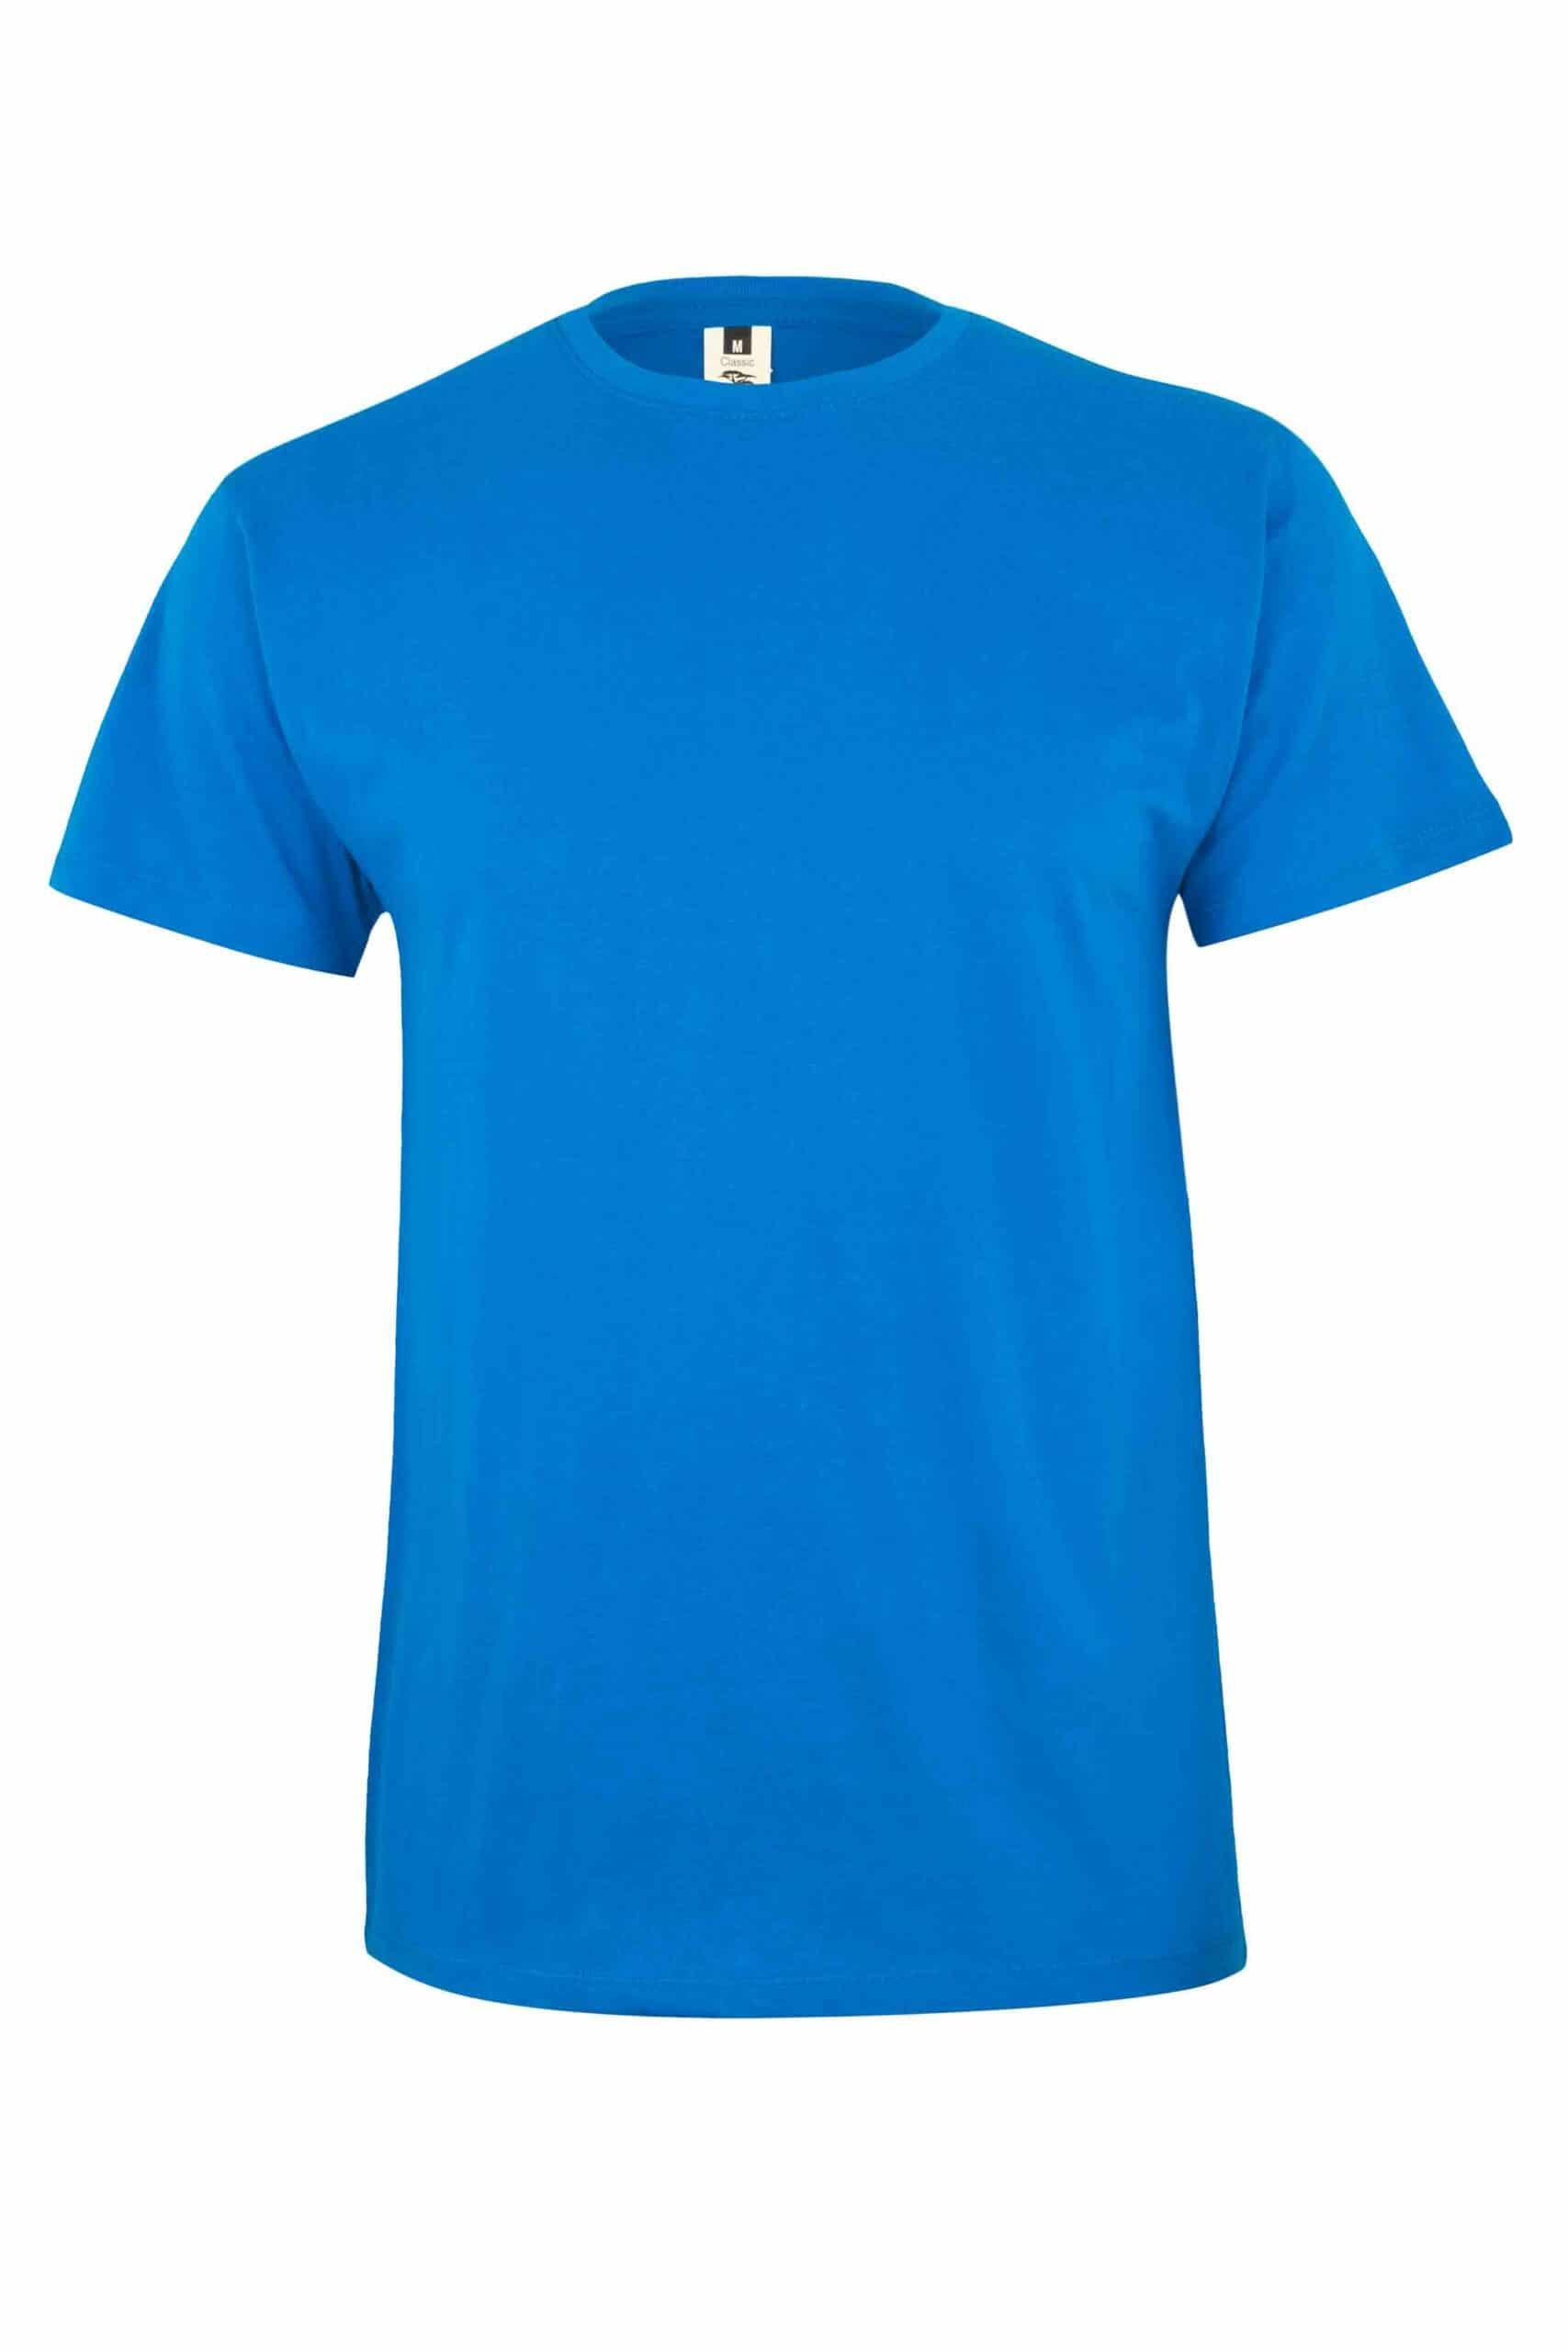 Mukua Mk022cv Camiseta Manga Corta 150gr Atoll